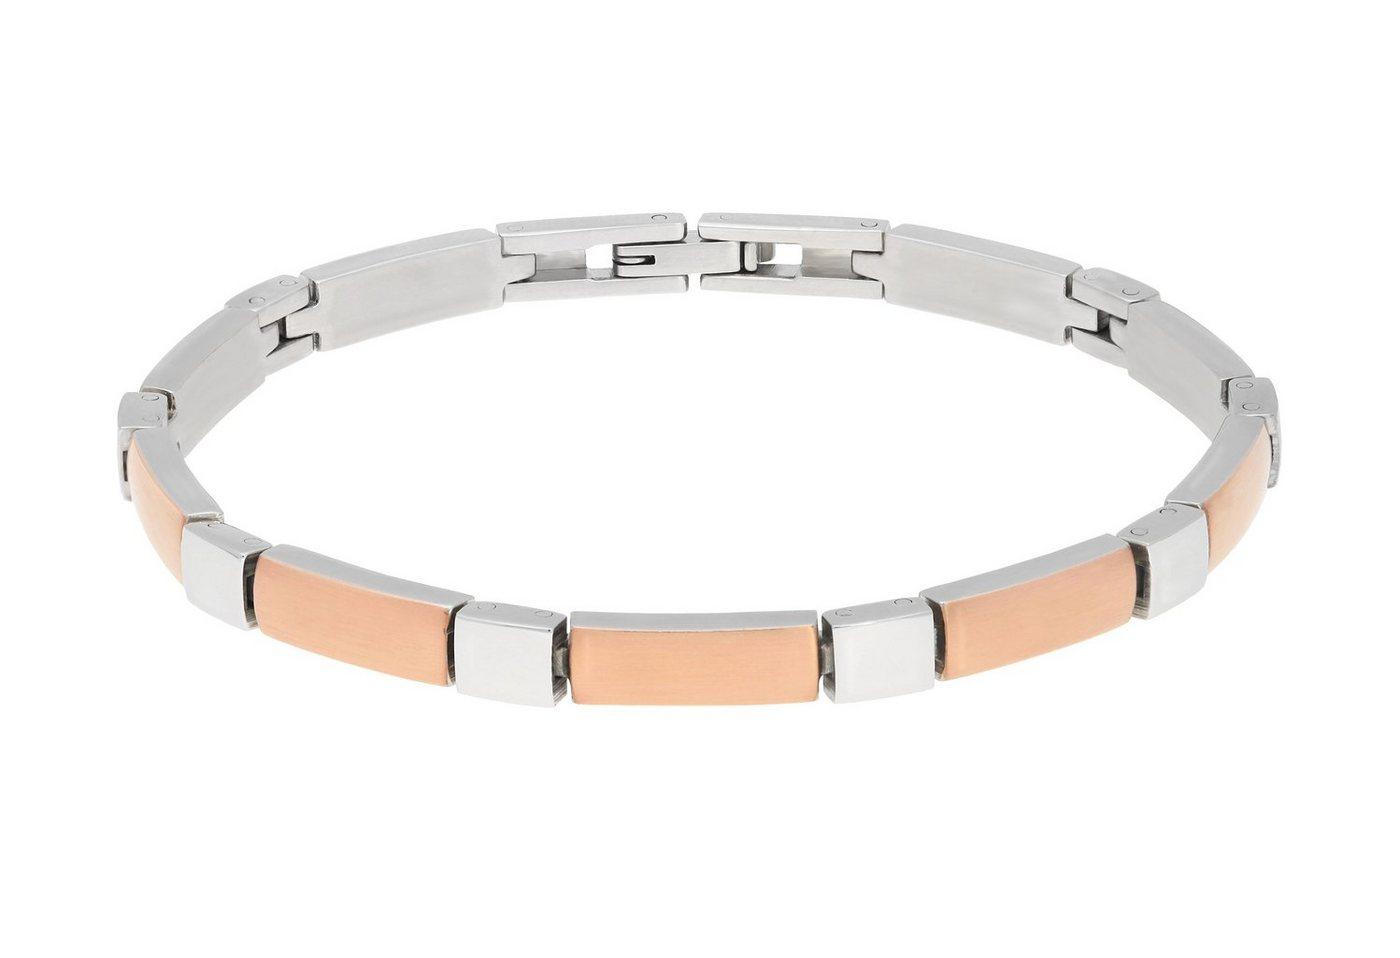 TITANIA Gliederarmband »Titanarmband« bicolor | Schmuck > Armbänder > Gliederarmbänder | TITANIA